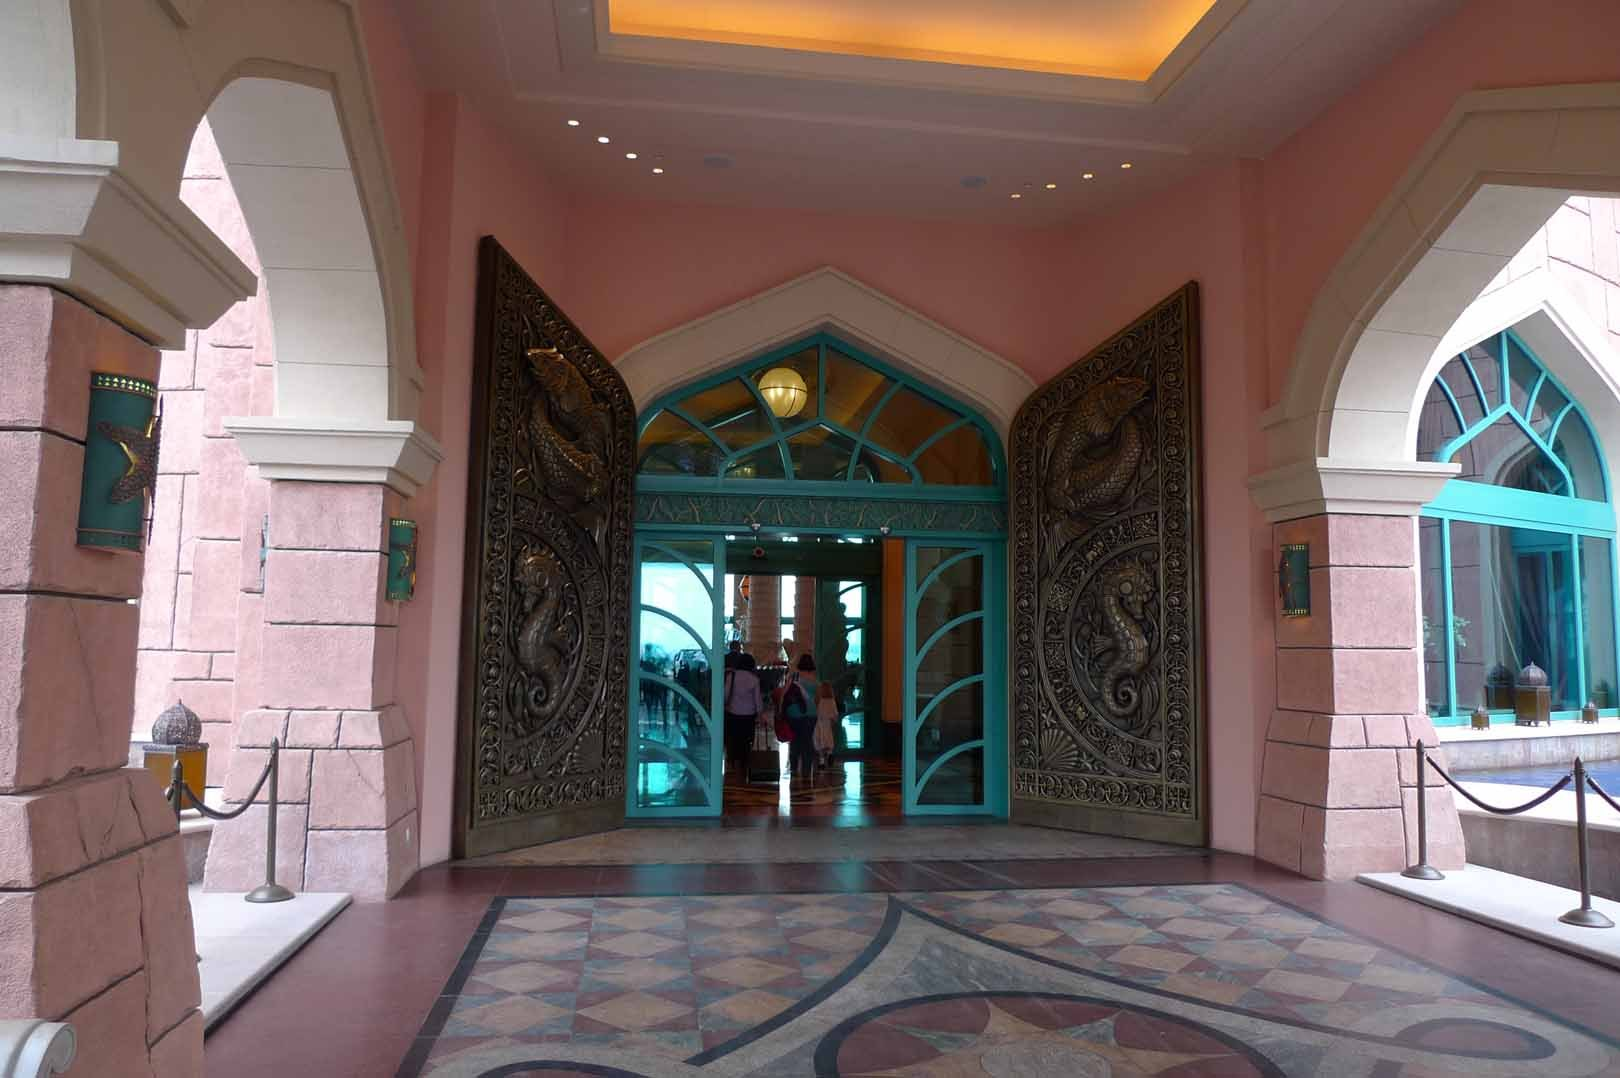 Dubai_Atlantis-The-Palm_Slideshow_001